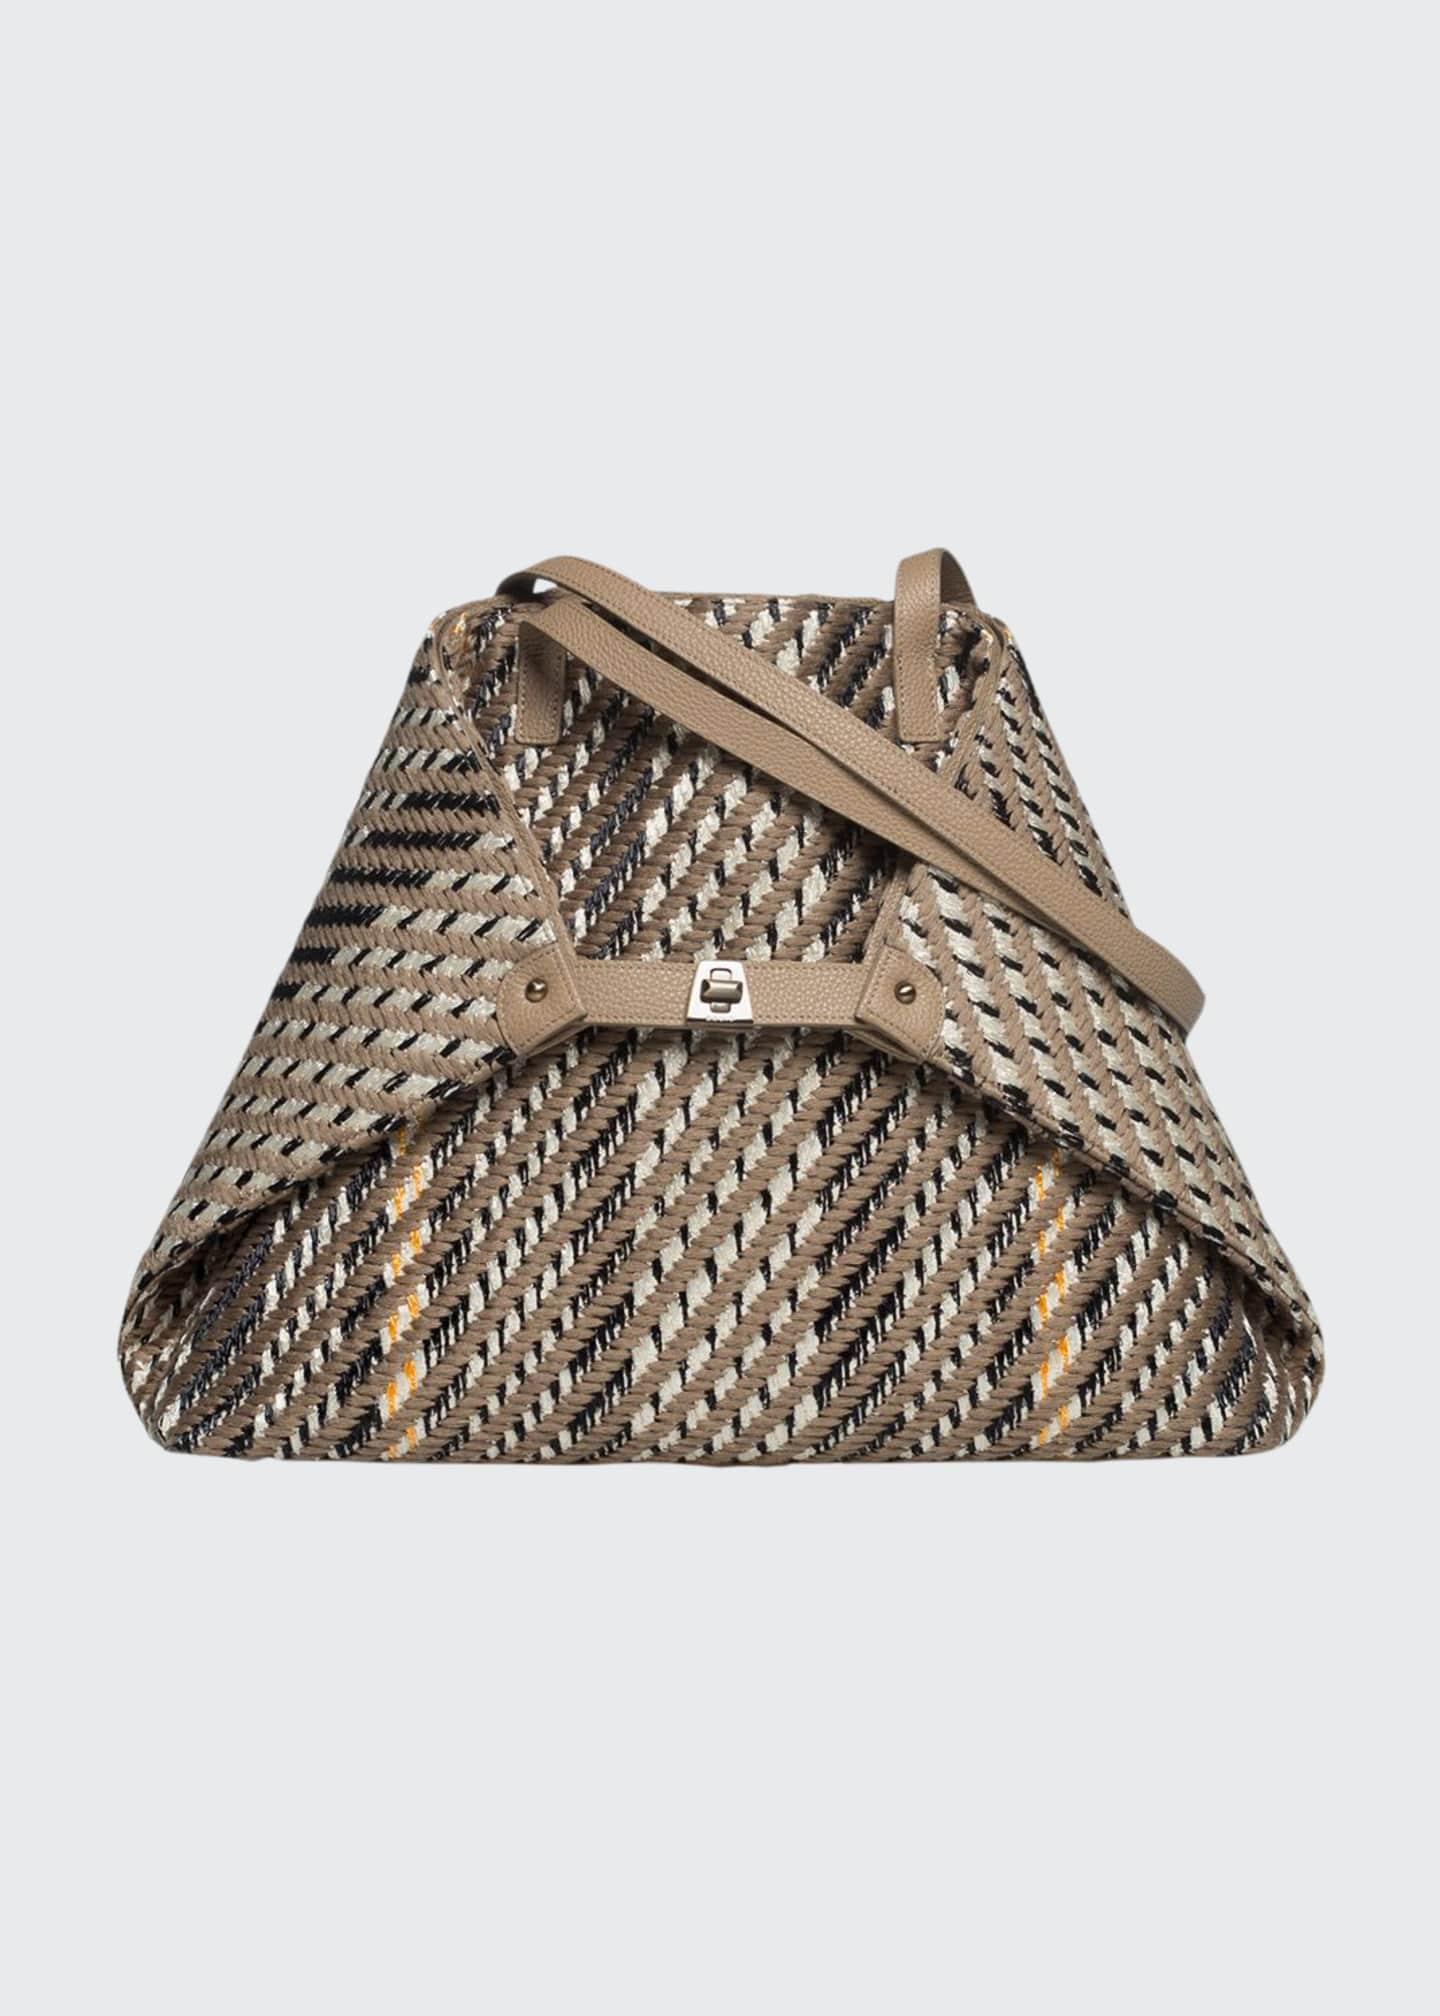 Akris AI Medium Soft Woven Shoulder Tote Bag